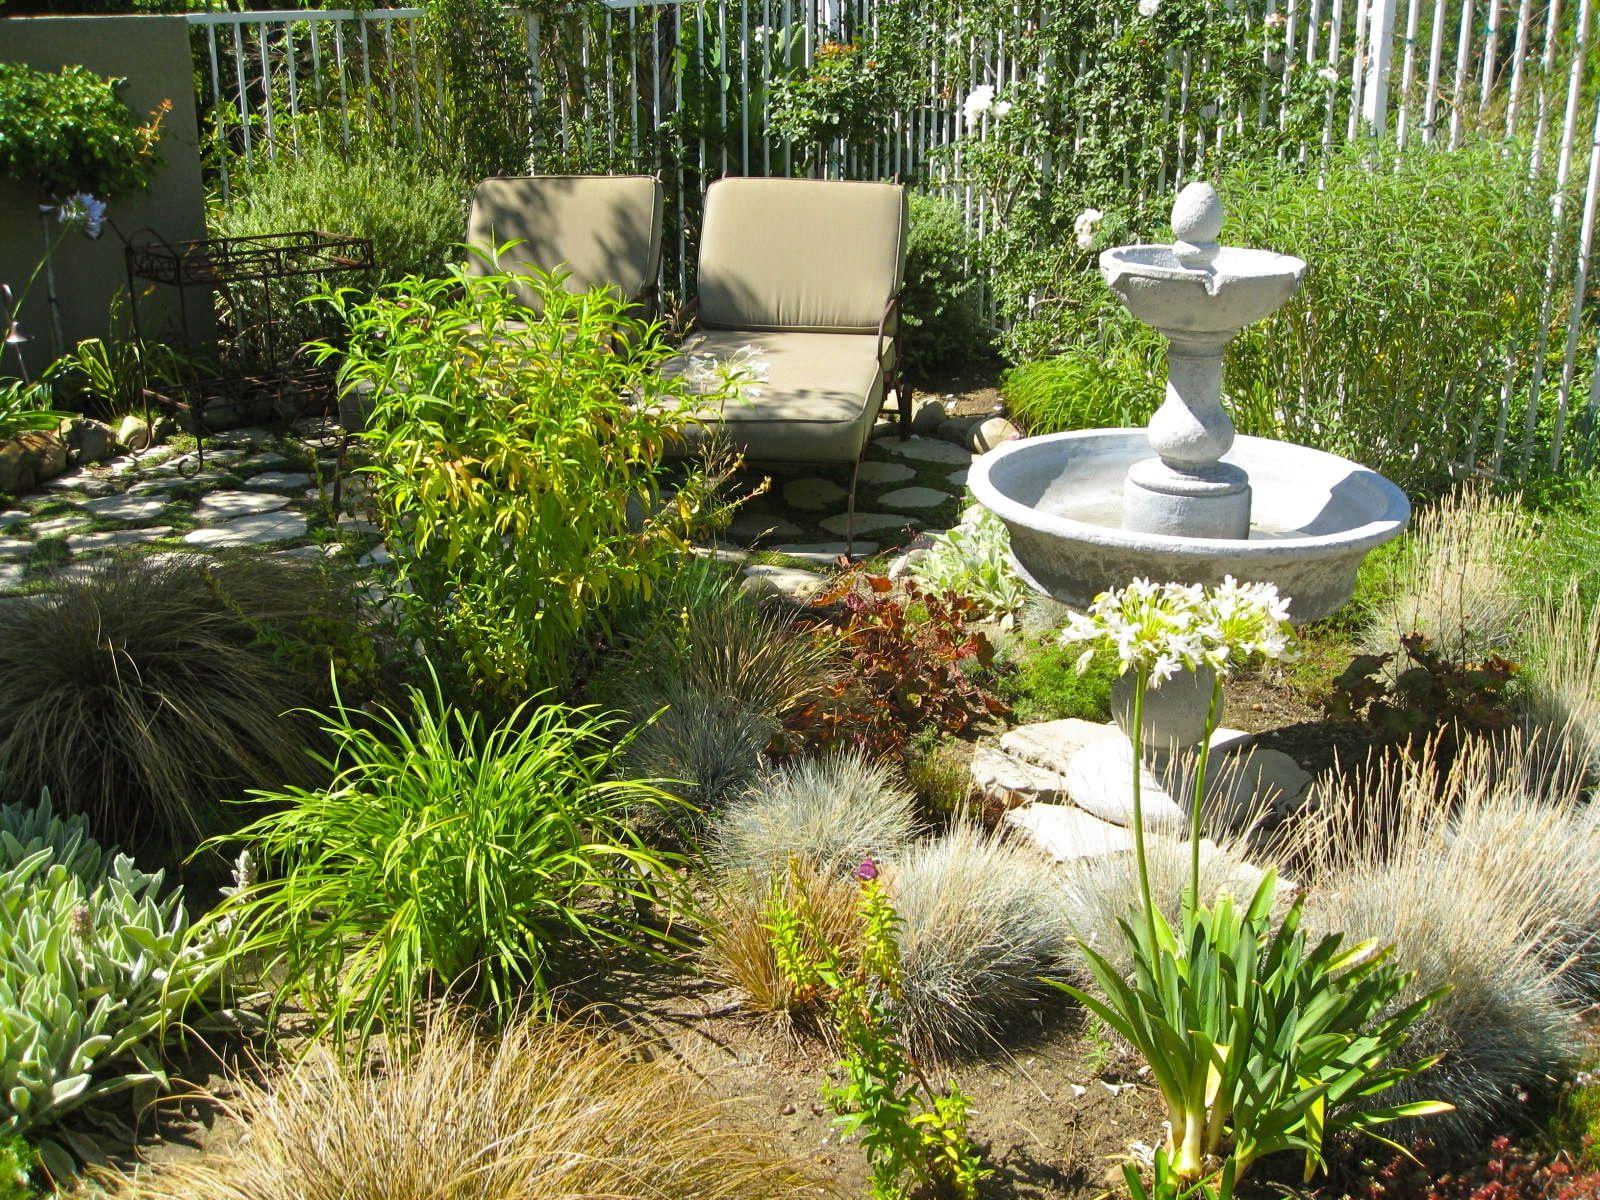 Astonishing Cheap No Grass Backyard Ideas | No grass ... on Cheap Backyard Ideas No Grass  id=82324